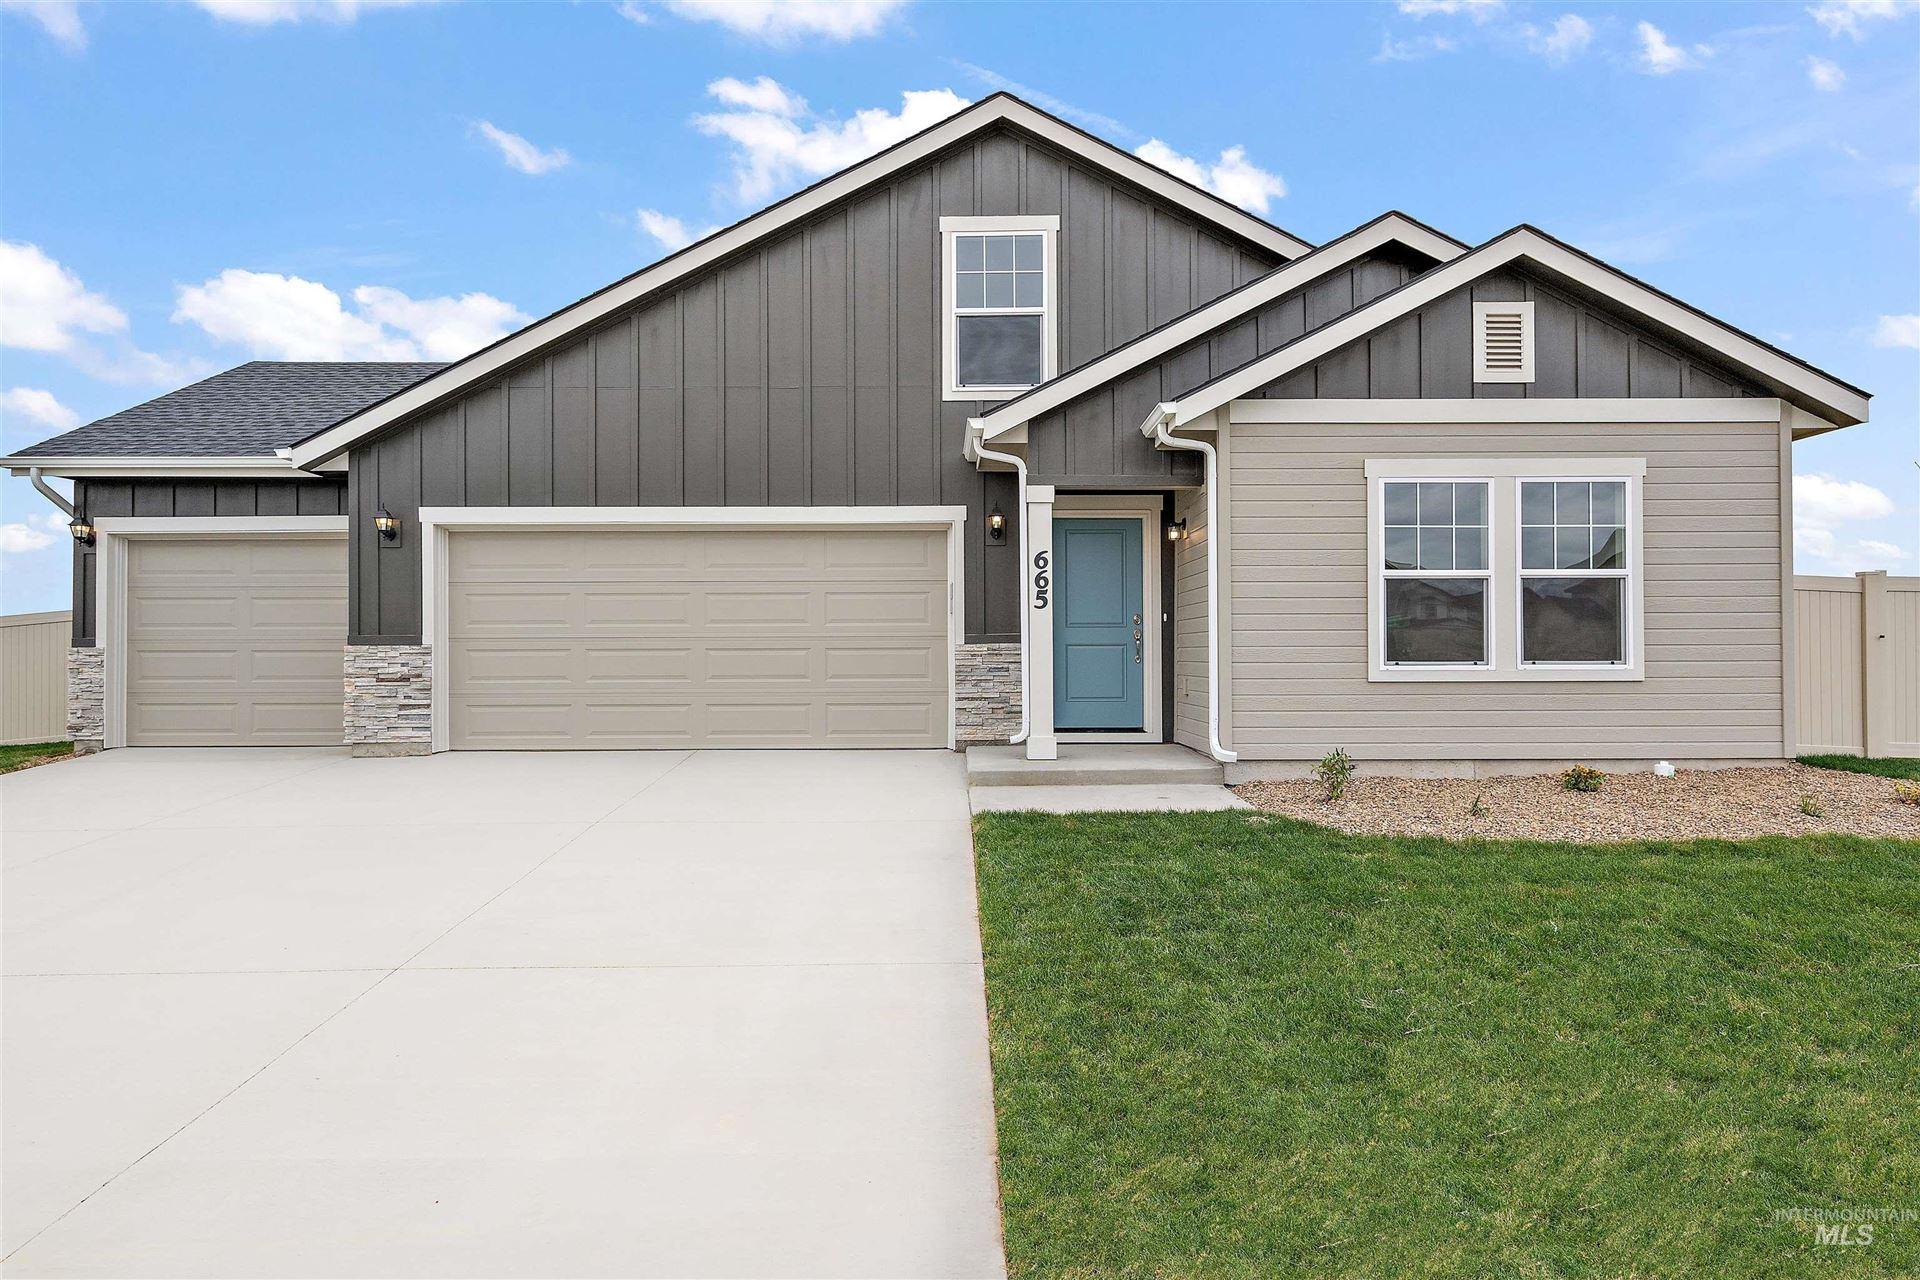 665 SW Raelynn St., Mountain Home, ID 83647 - MLS#: 98812666